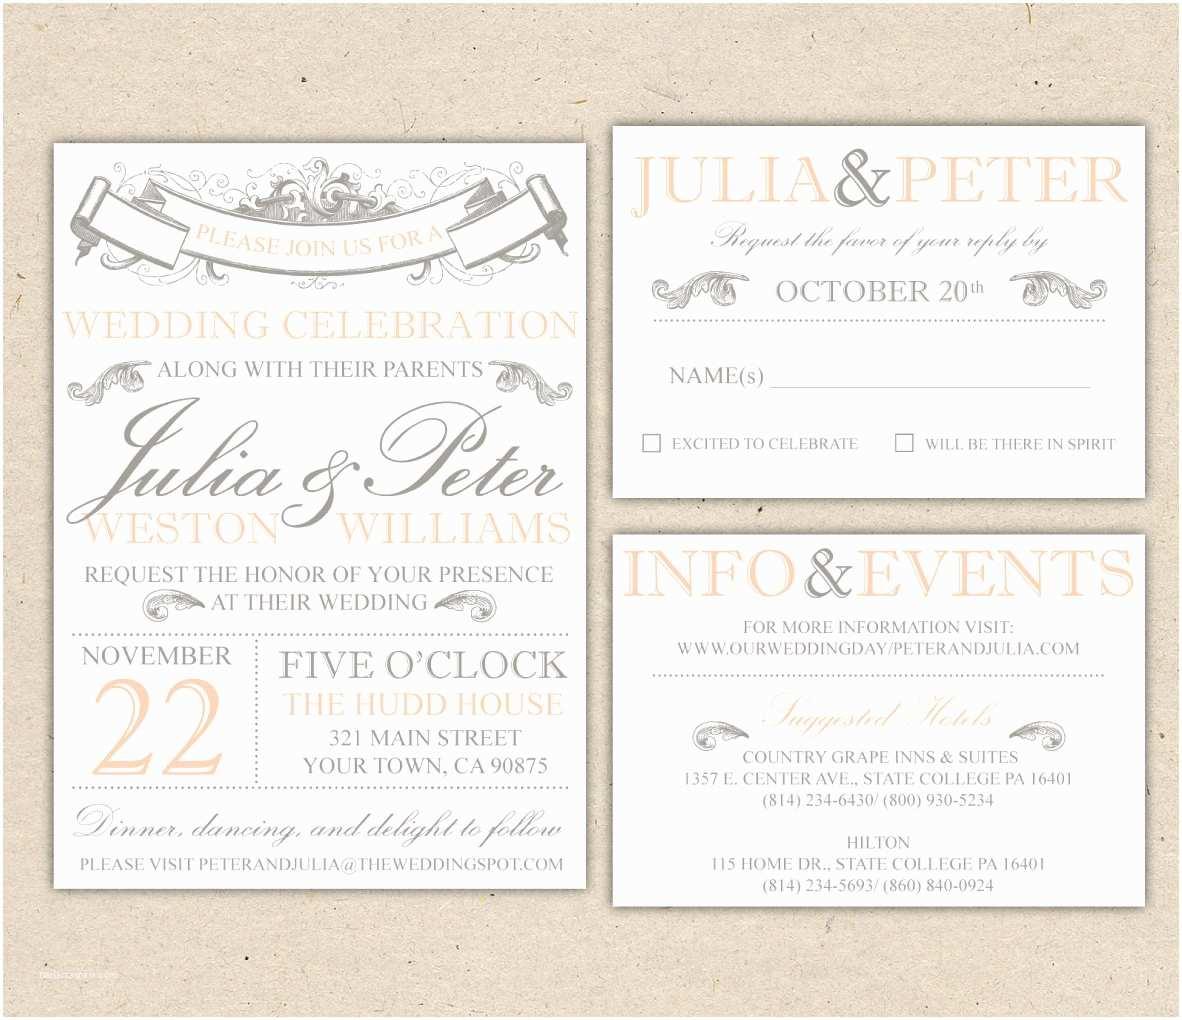 Wedding Invitation With Photo  Vintage Wedding Invitation